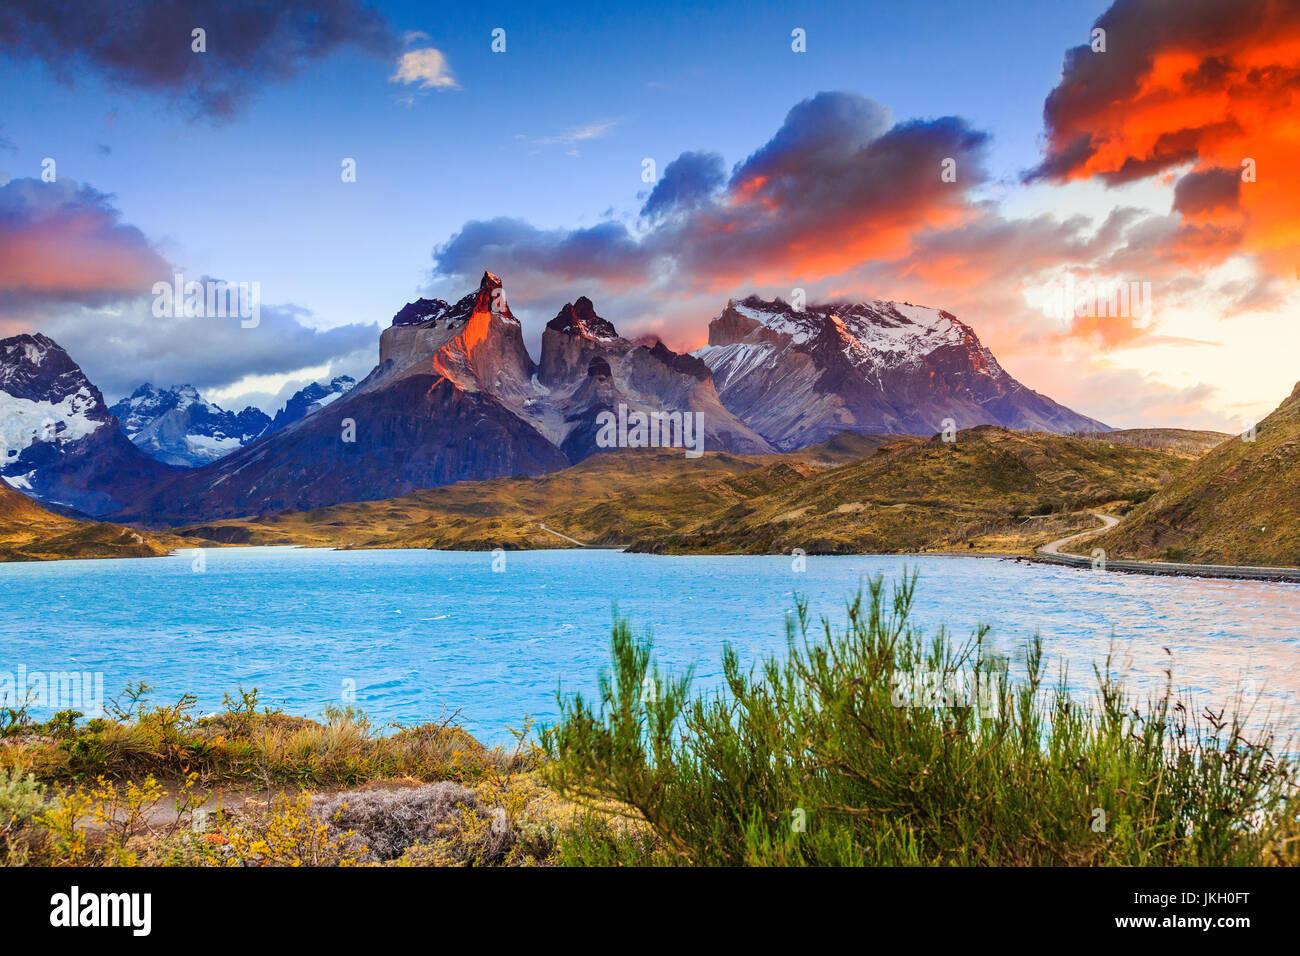 Parco Nazionale di Torres del Paine Cile. Lago Pehoe a sunrise. Immagini Stock